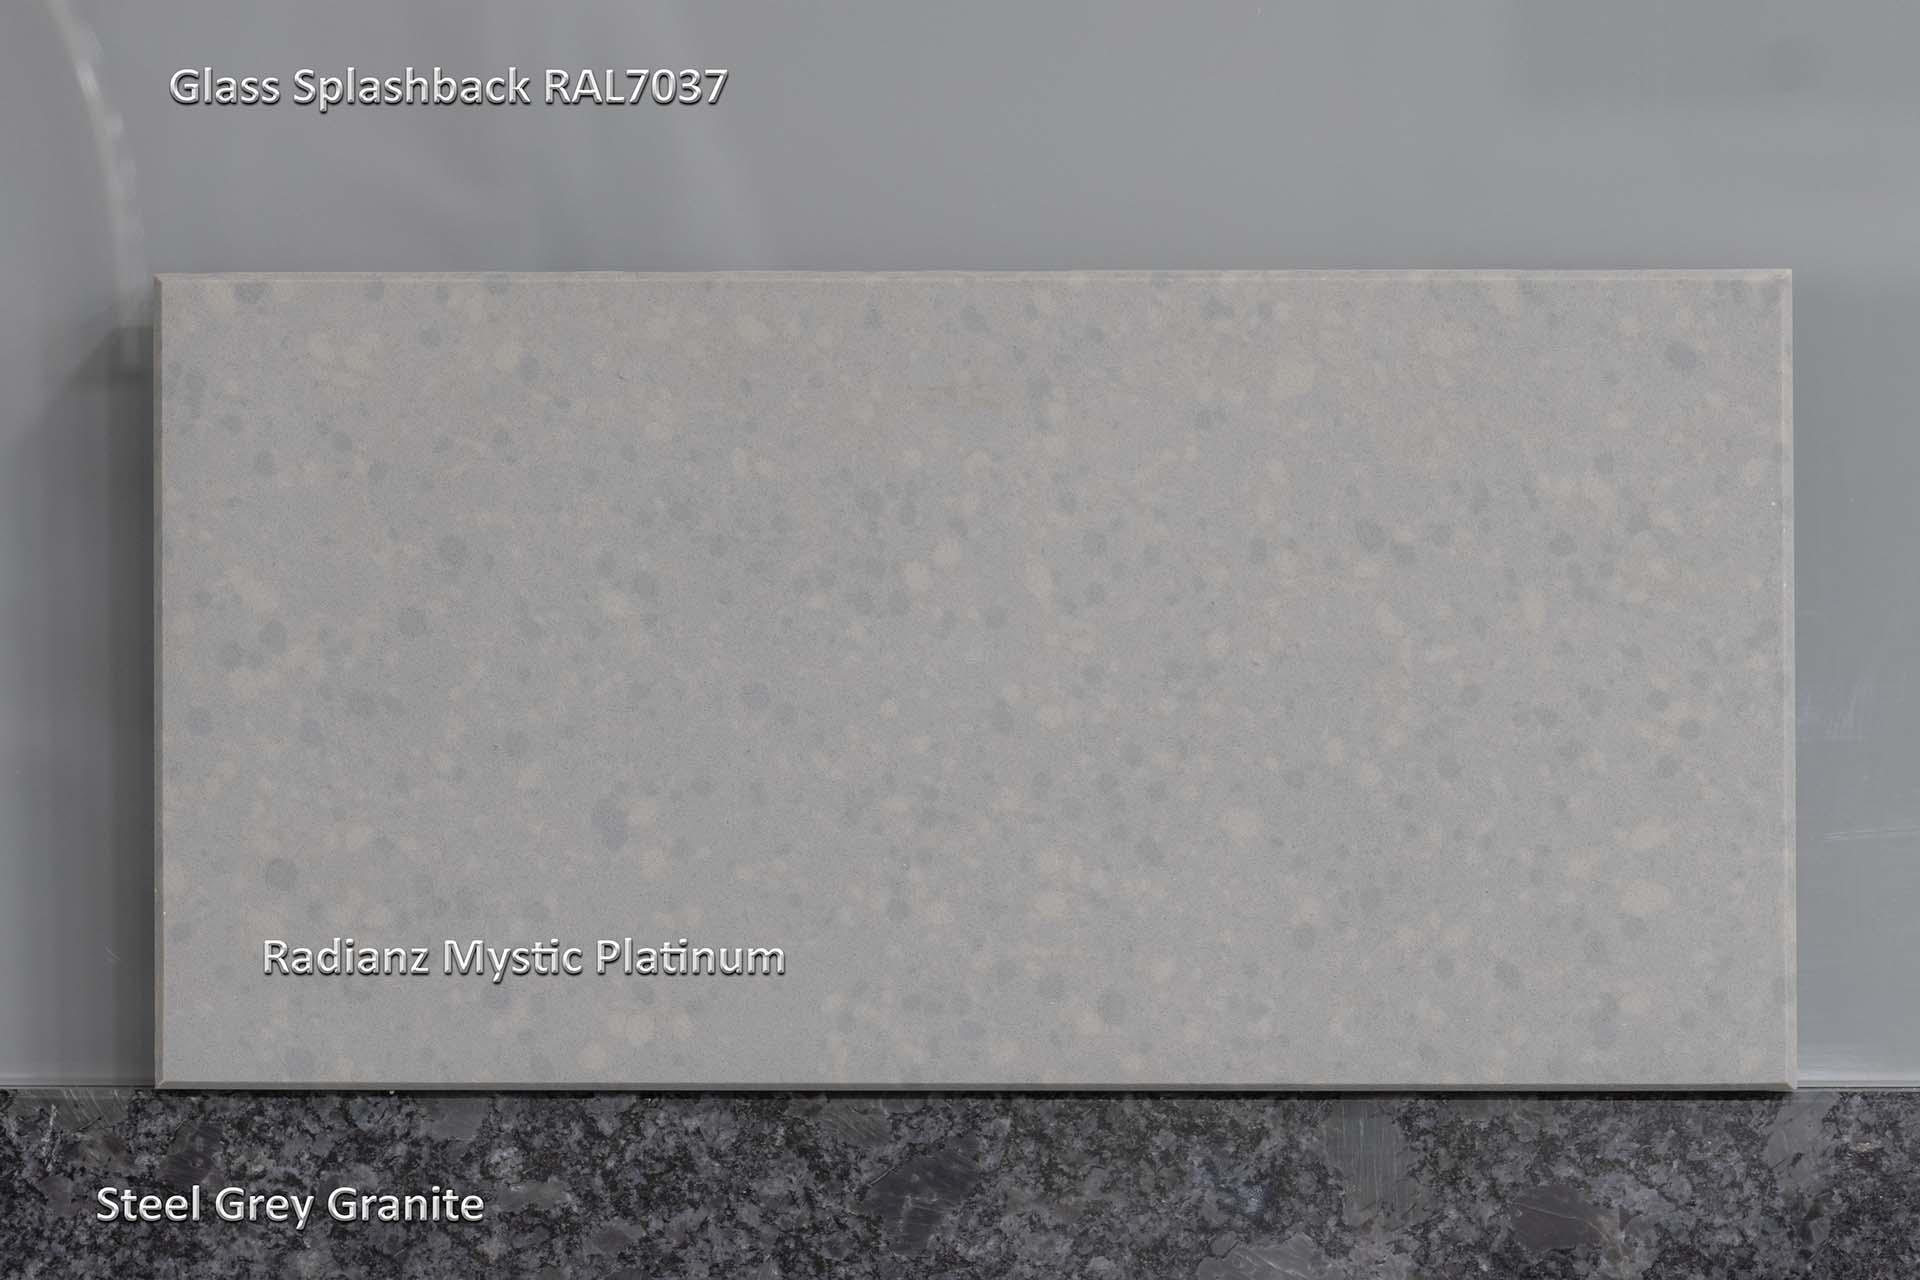 Radianz Mystic Platinum quartz worktops are the best say Brett and Jade from Cosentino red